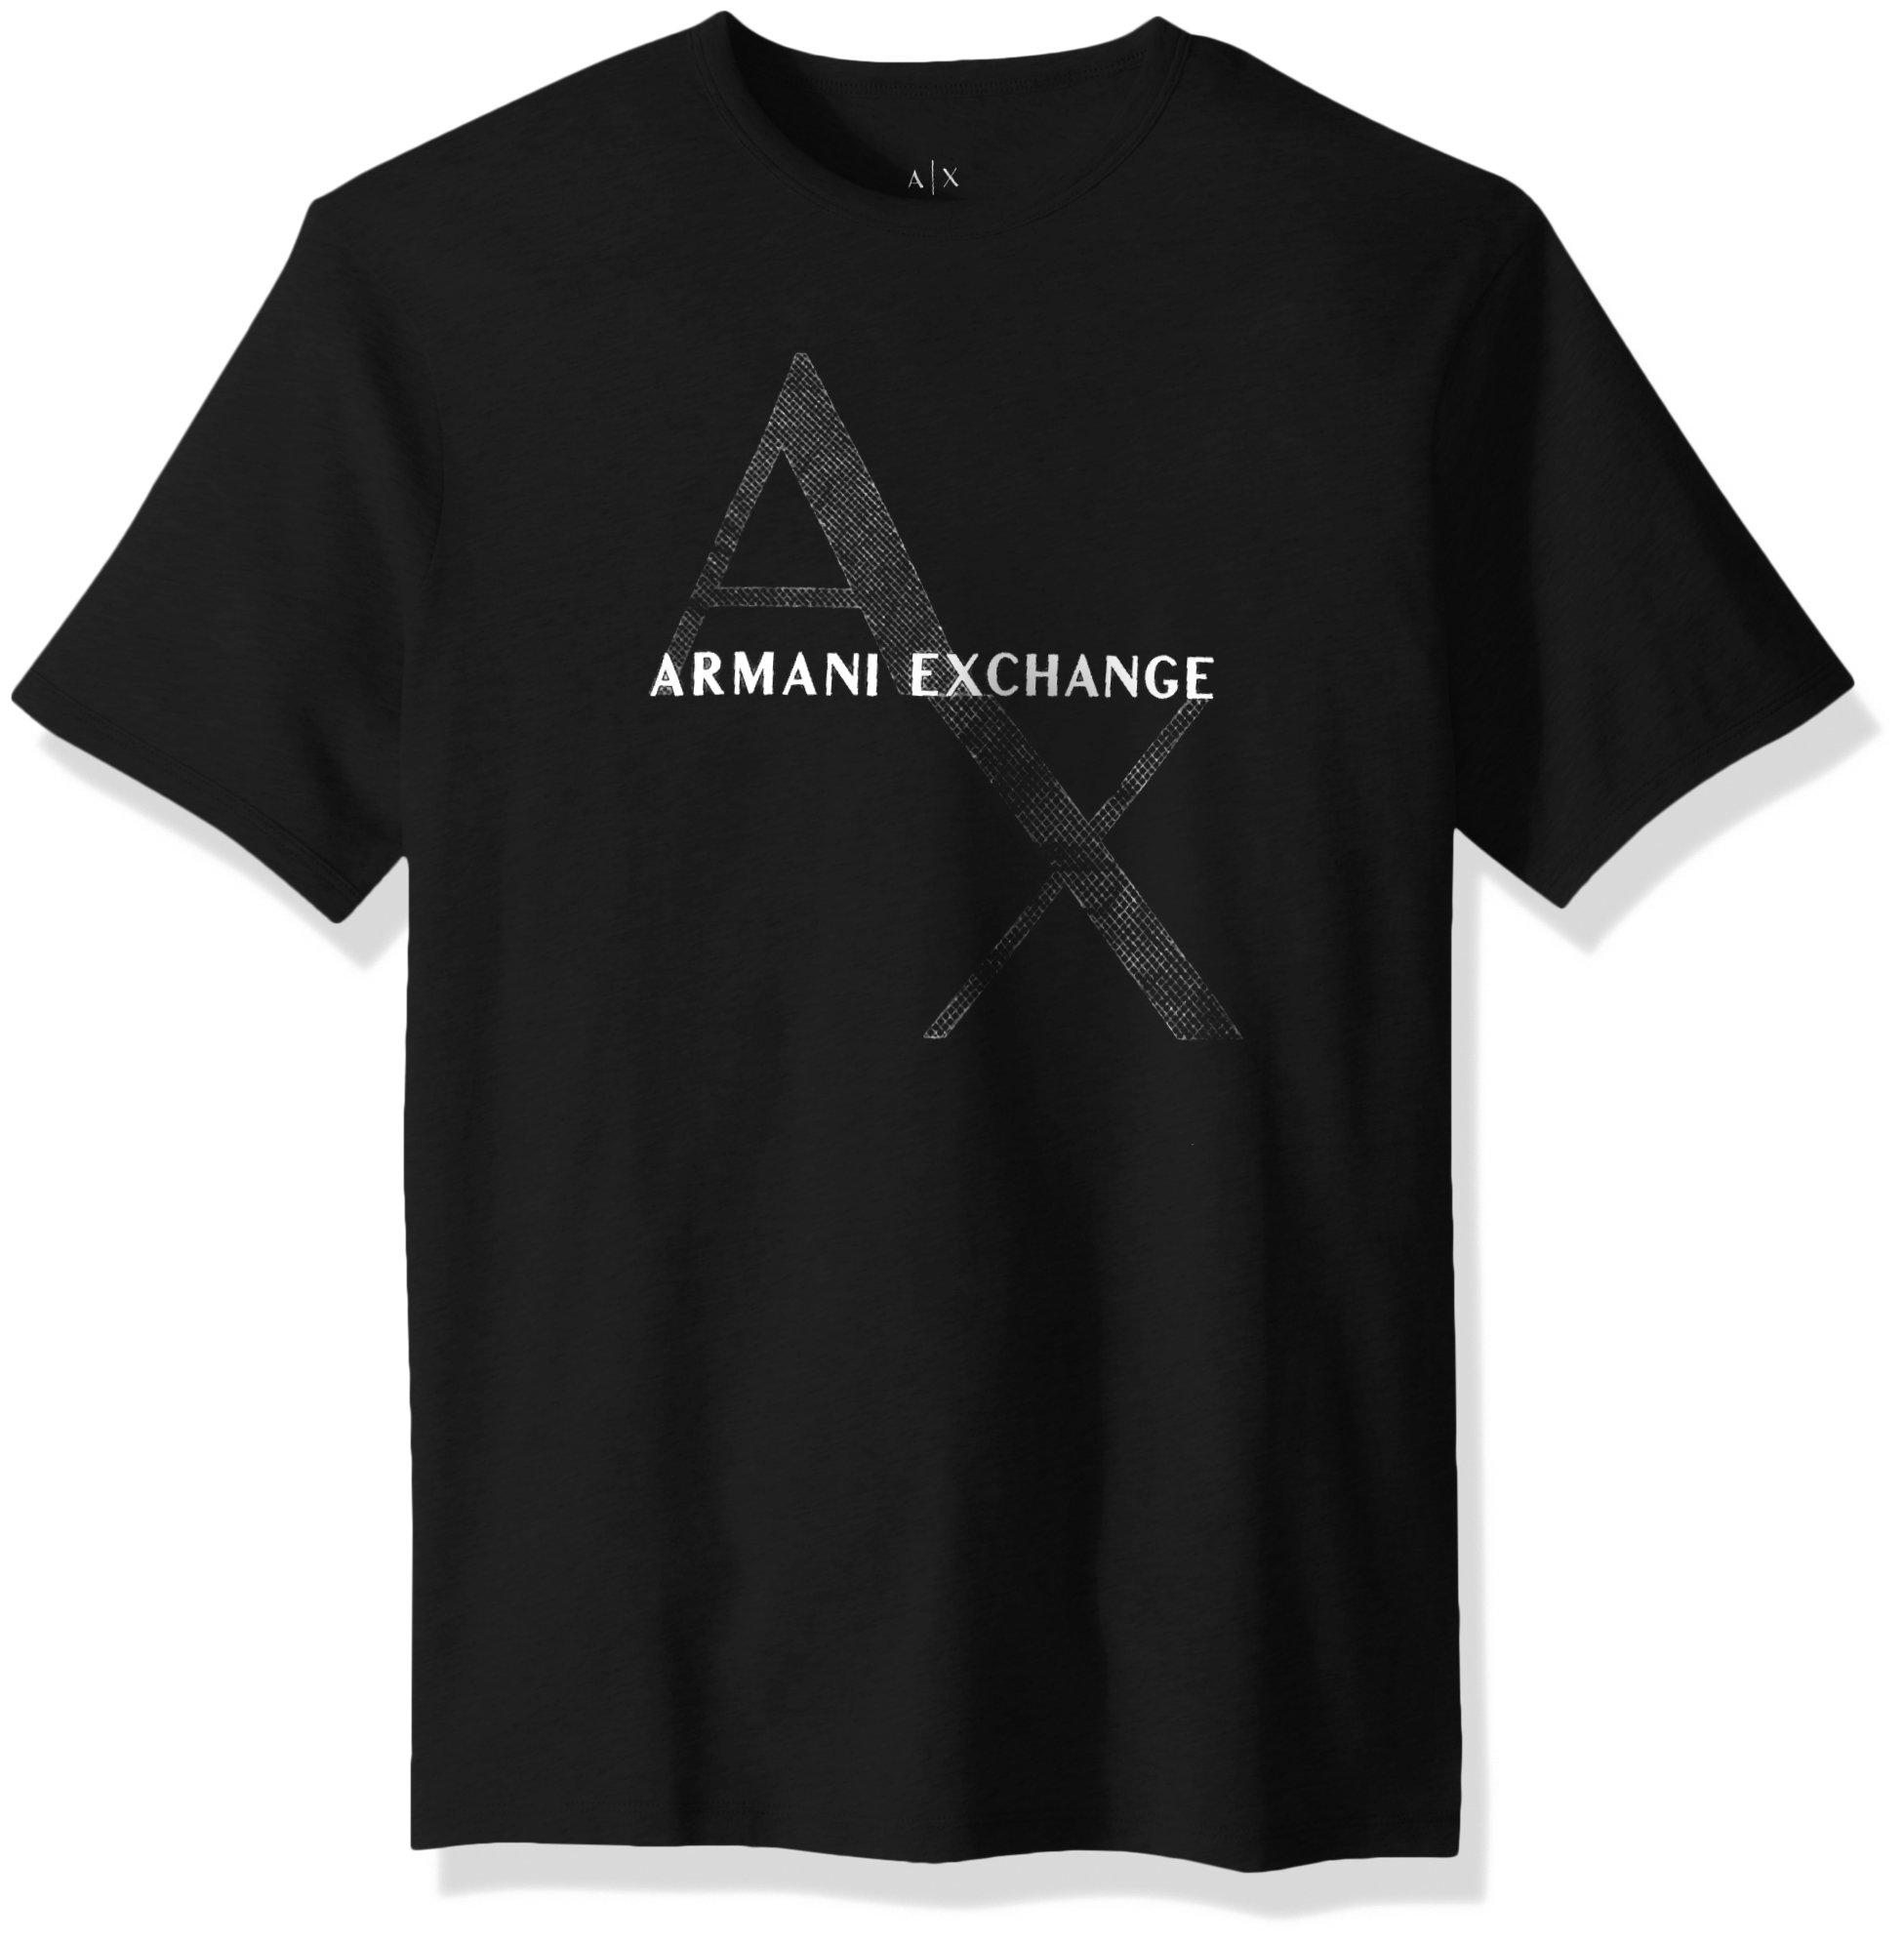 A|X Armani Exchange Men's Tonal and Contrast Logo Core Crew Neck, Black, XXL